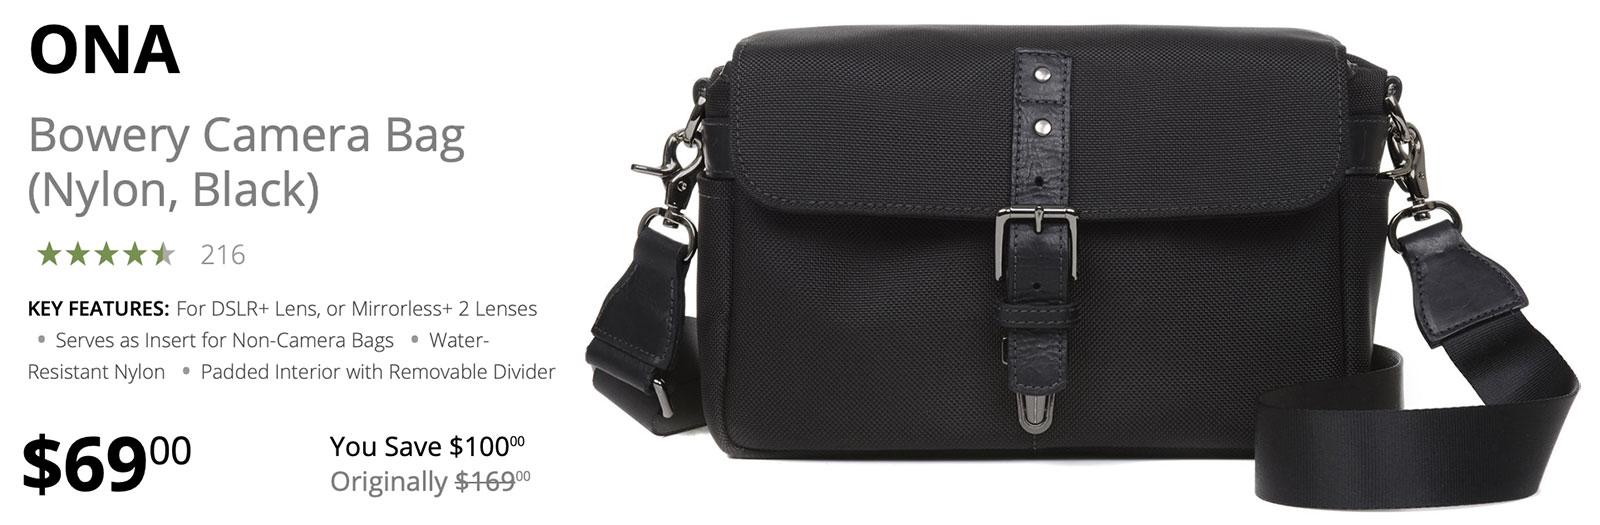 Save $100 Today on ONA Bowery Camera Bag